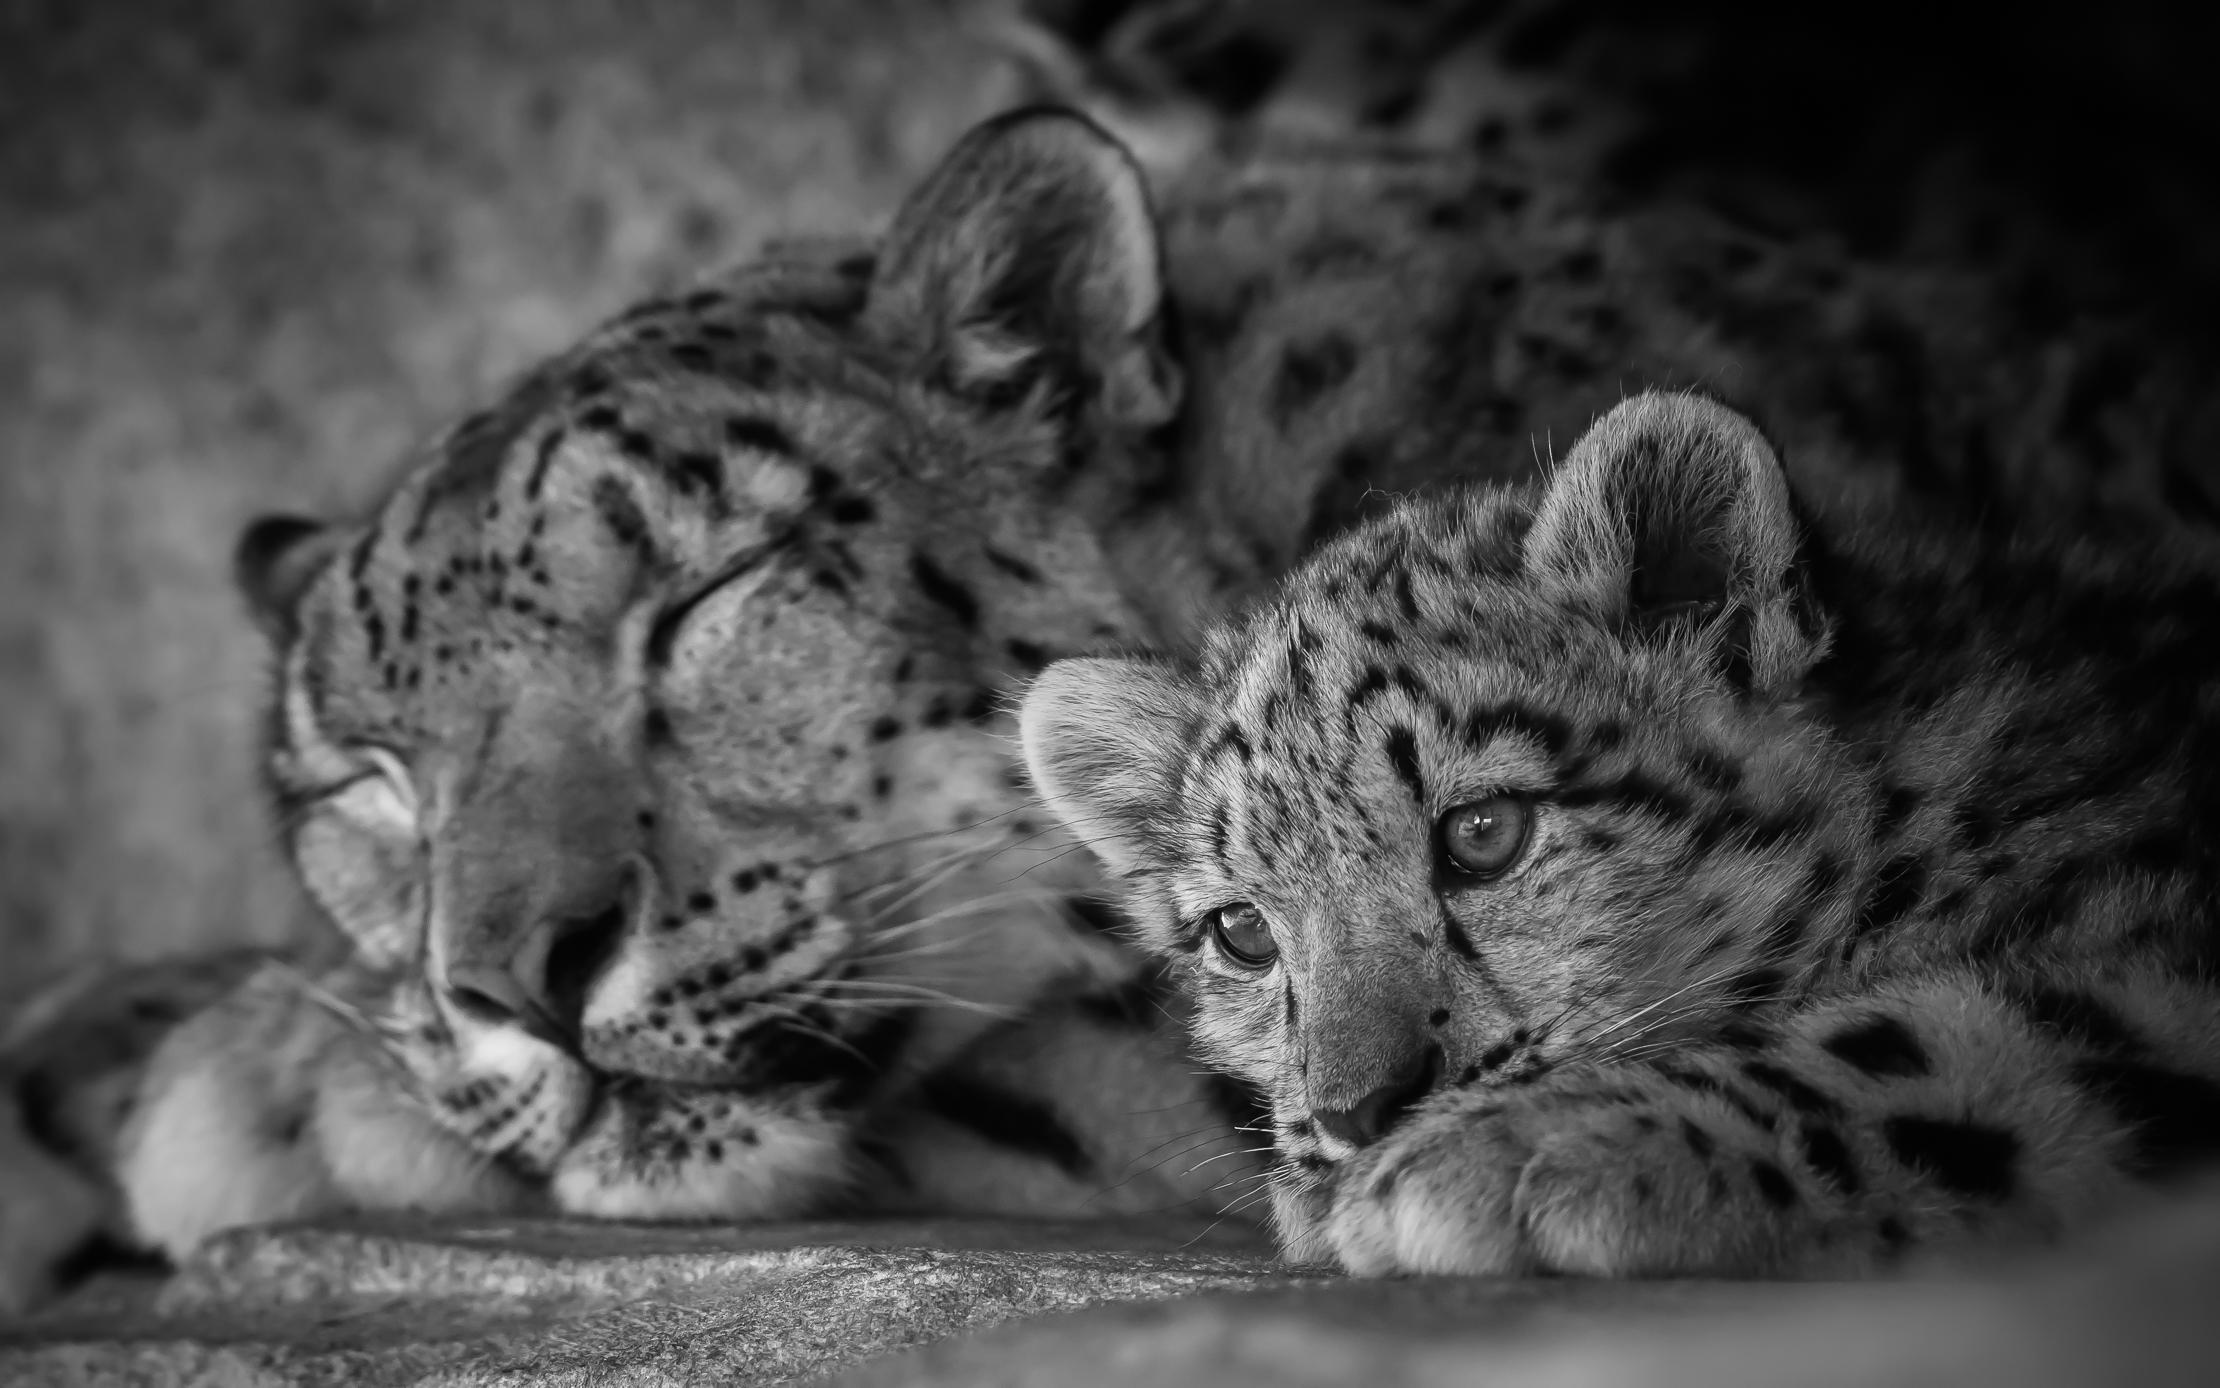 Wallpaper Blackandwhite Bw Monochrome Animal Animals Cat Cub